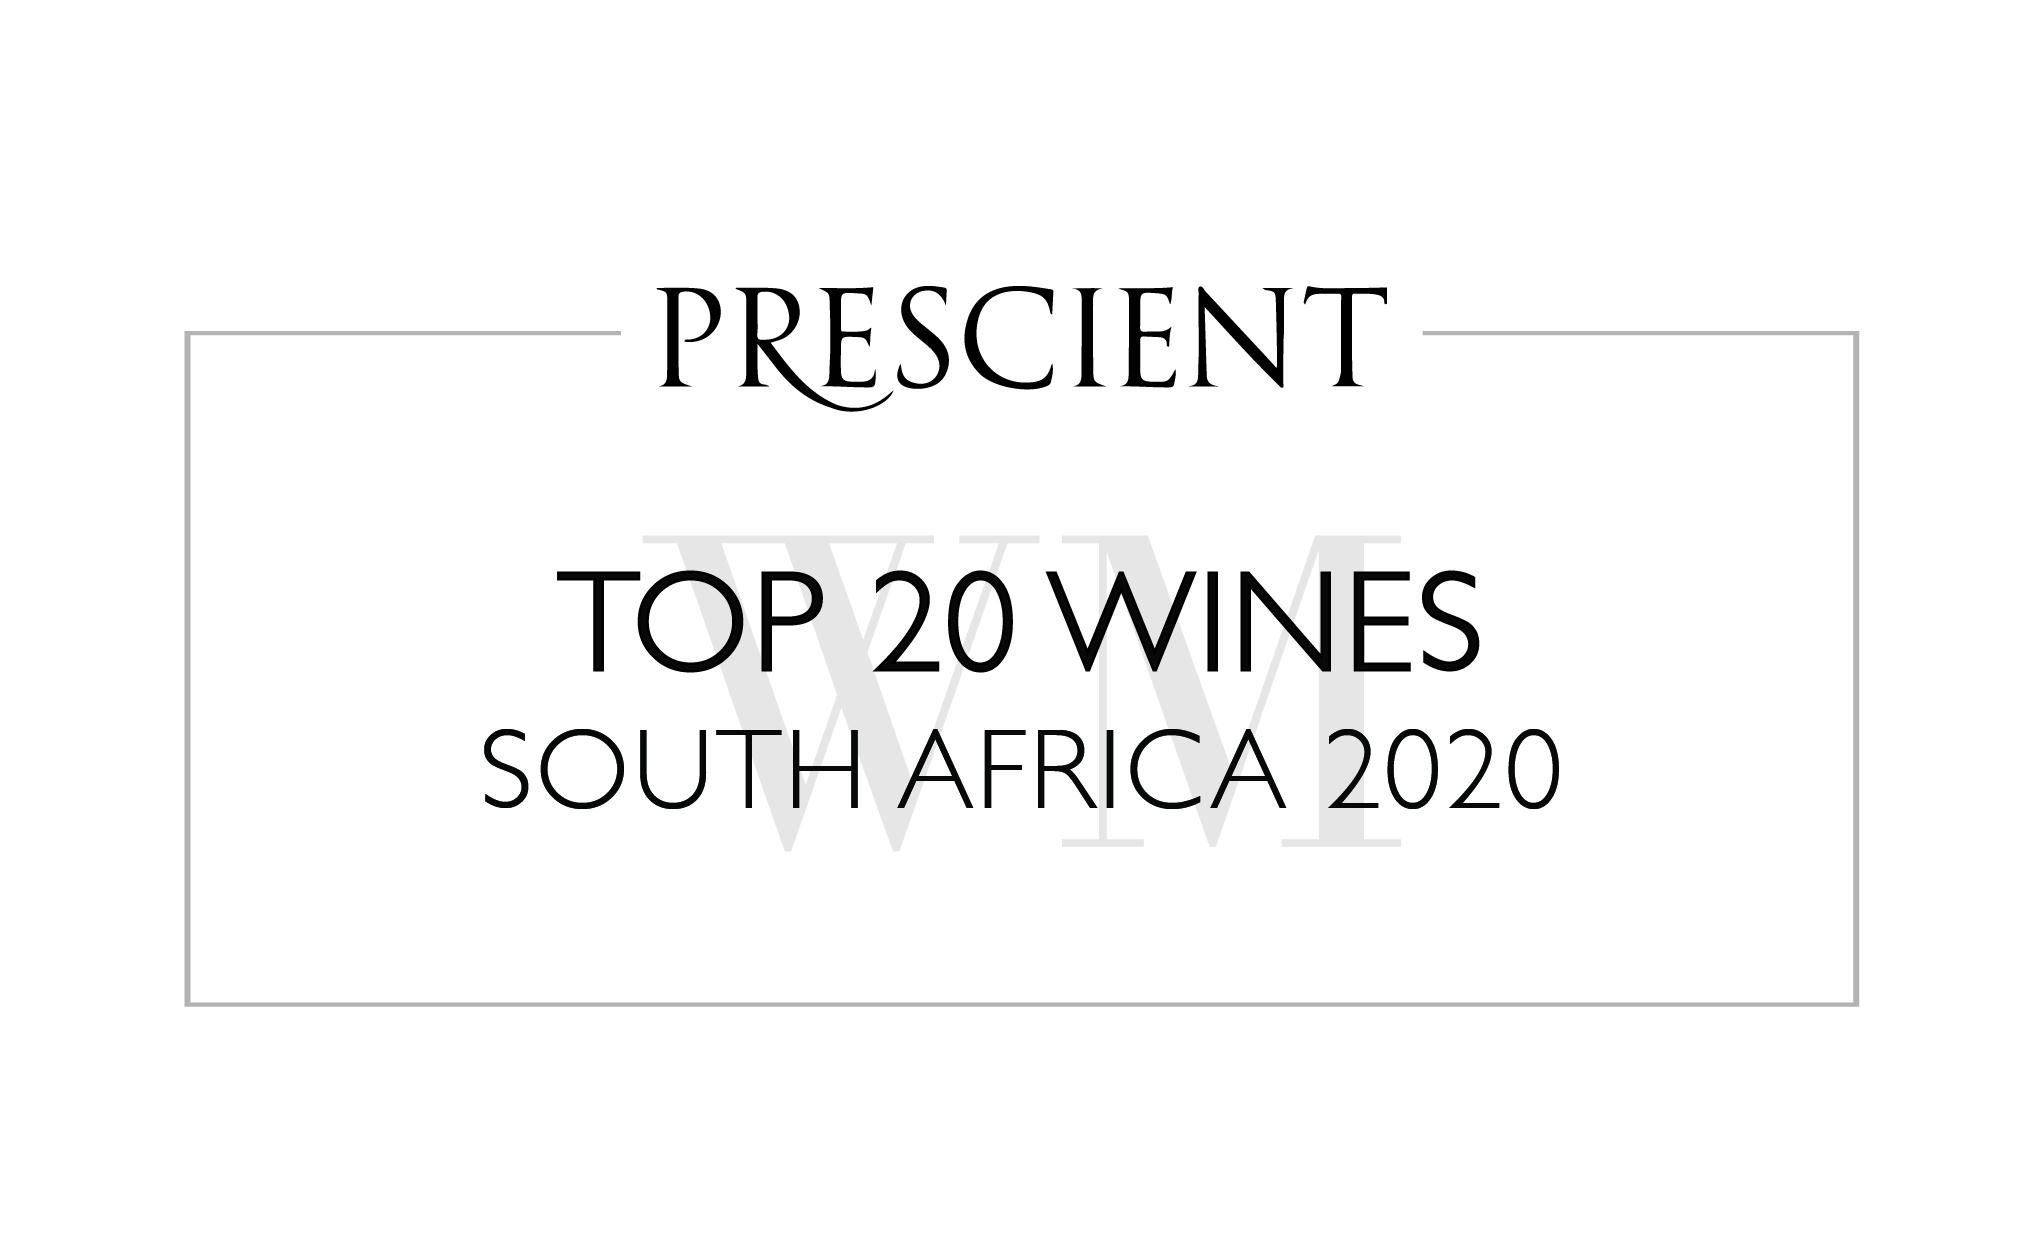 Prescient Top 20 Wines South Africa 2020 Report photo